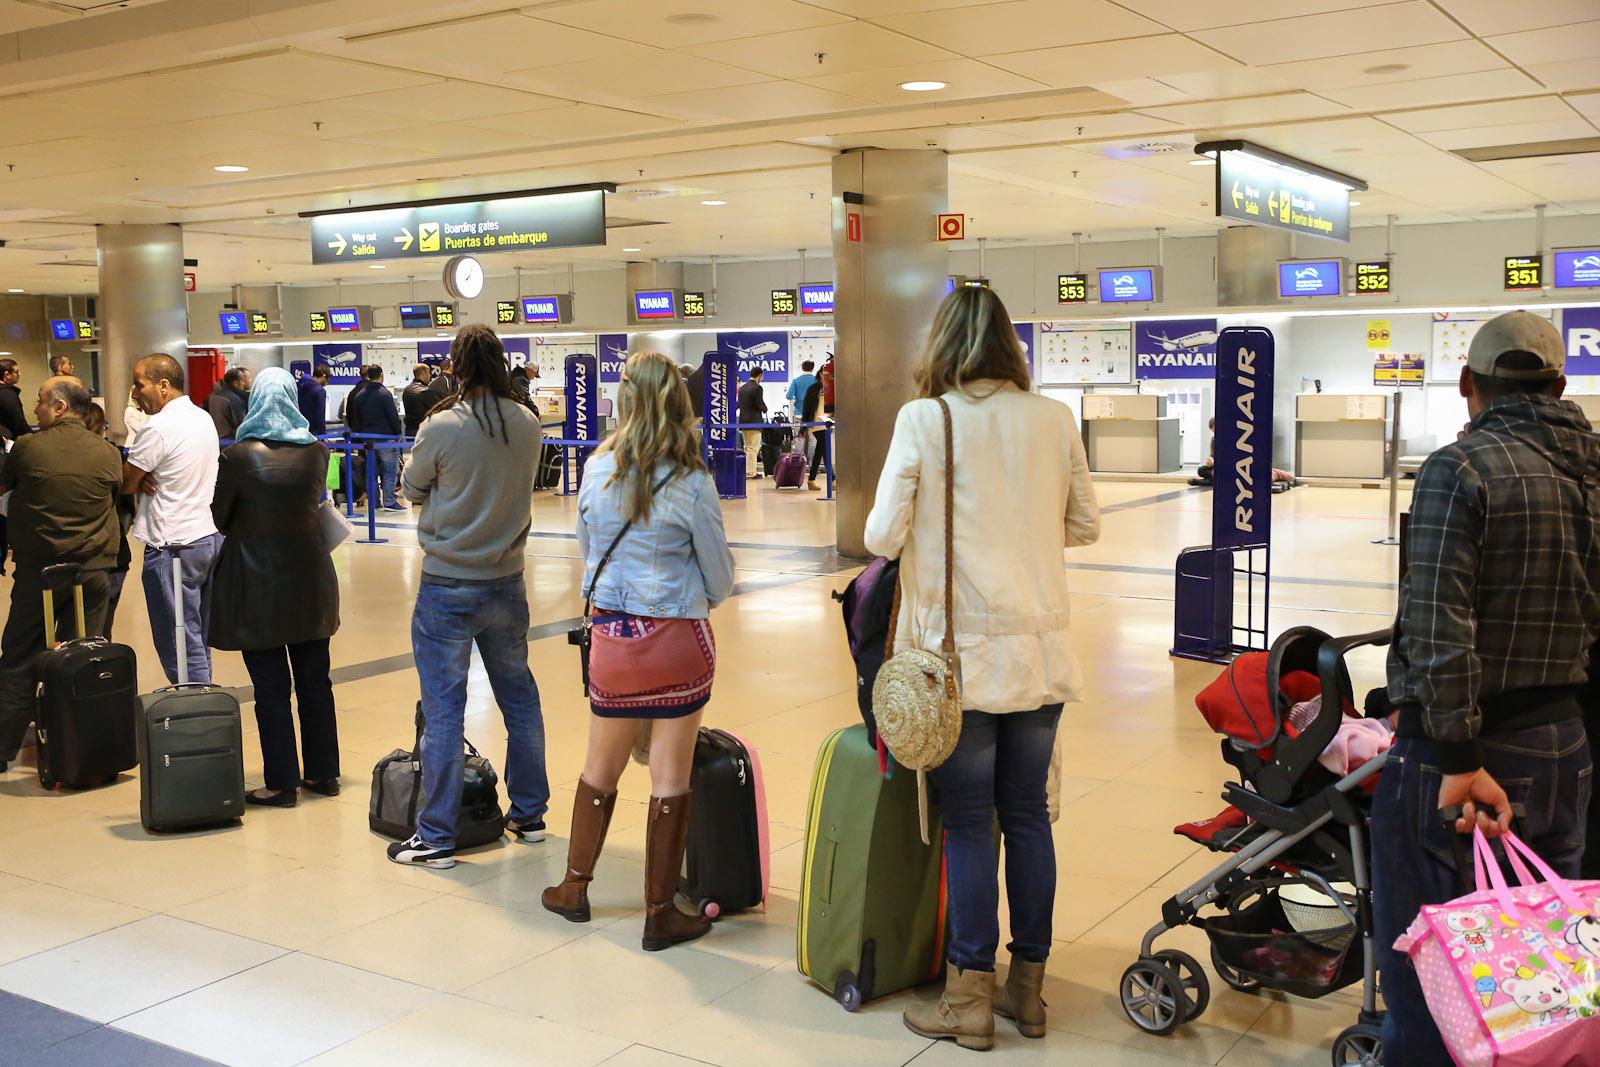 Регистрация на рейс авиакомпании Ryanair в аэропорту Мадрид Барахас